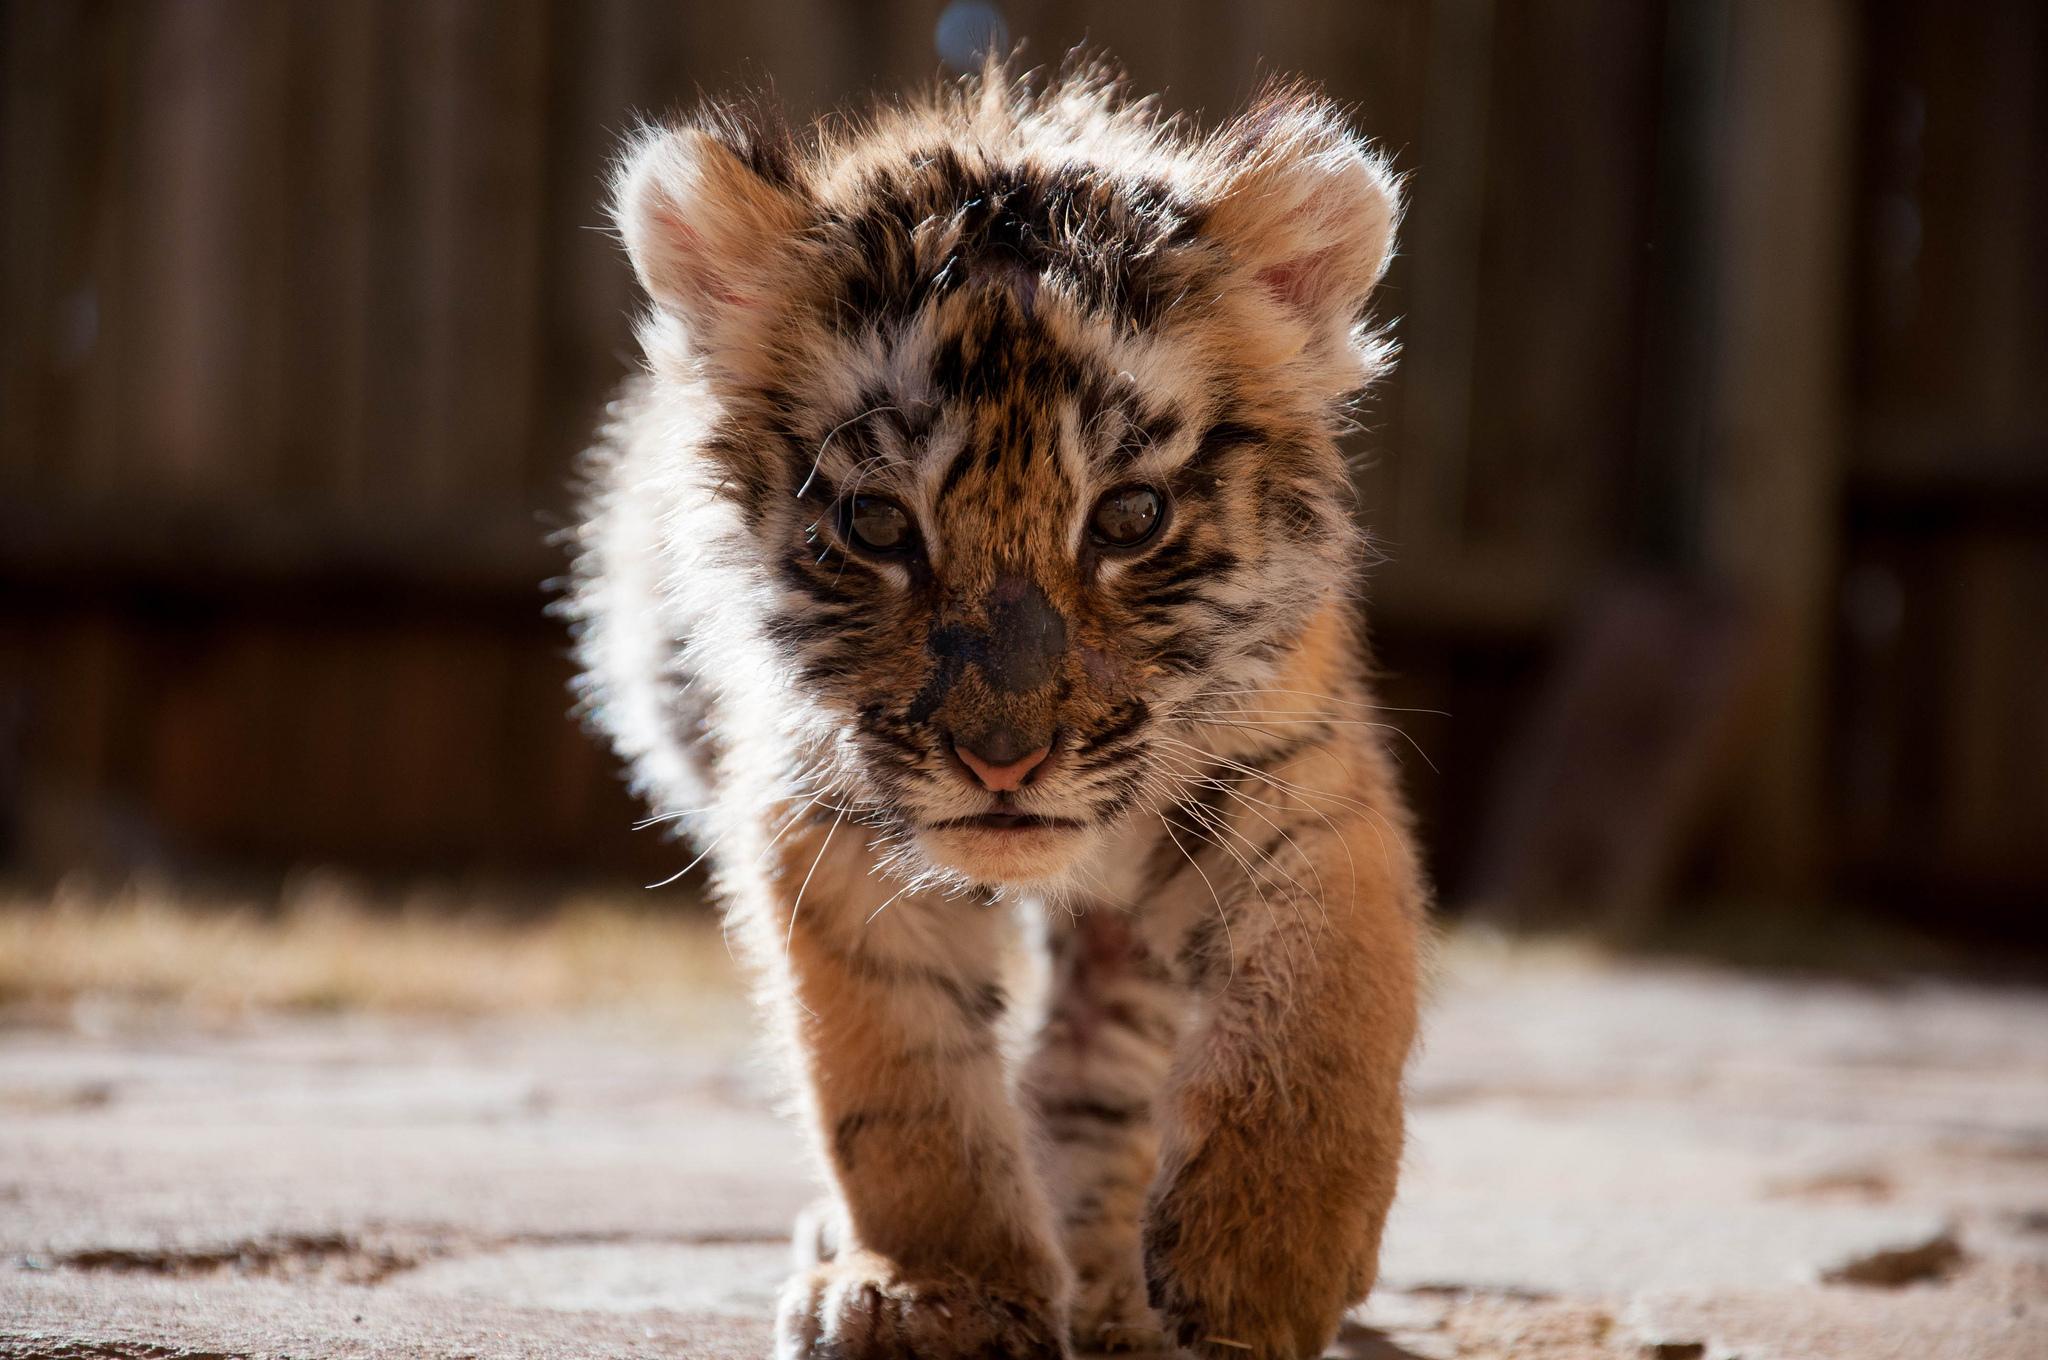 tiger baby cub cute